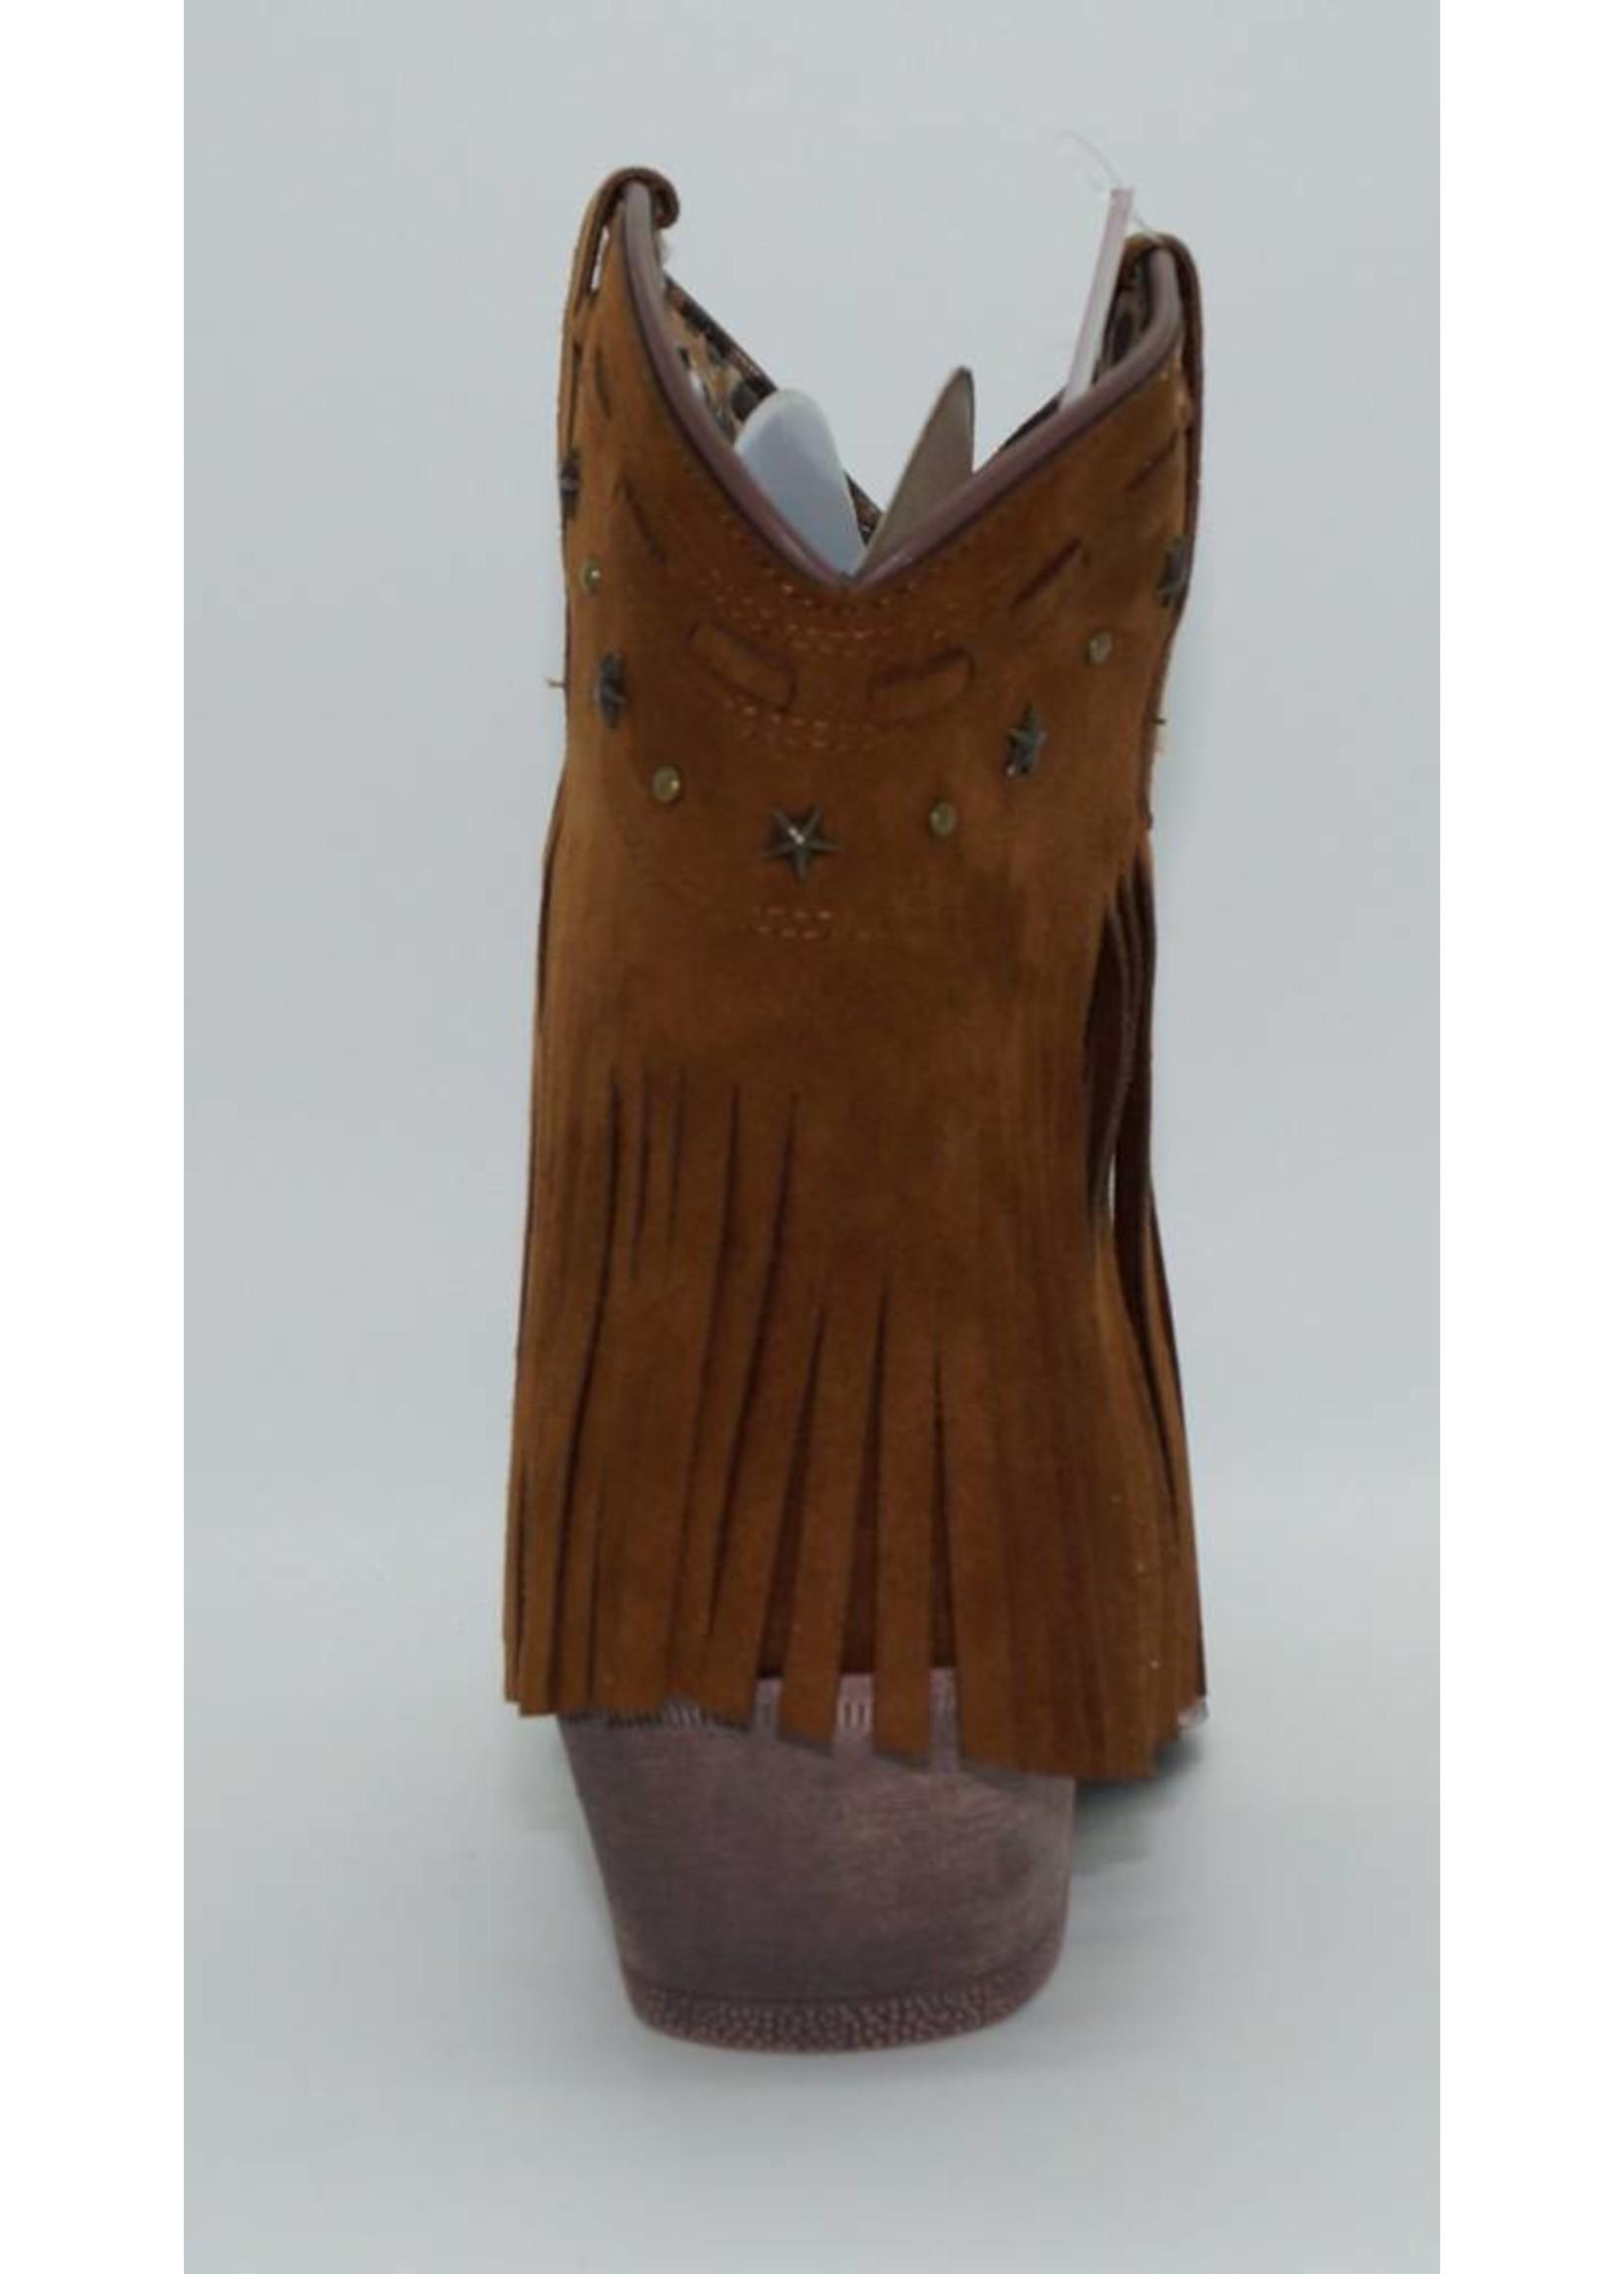 Dingo Women's Brown Tassel Western Boot DI7448